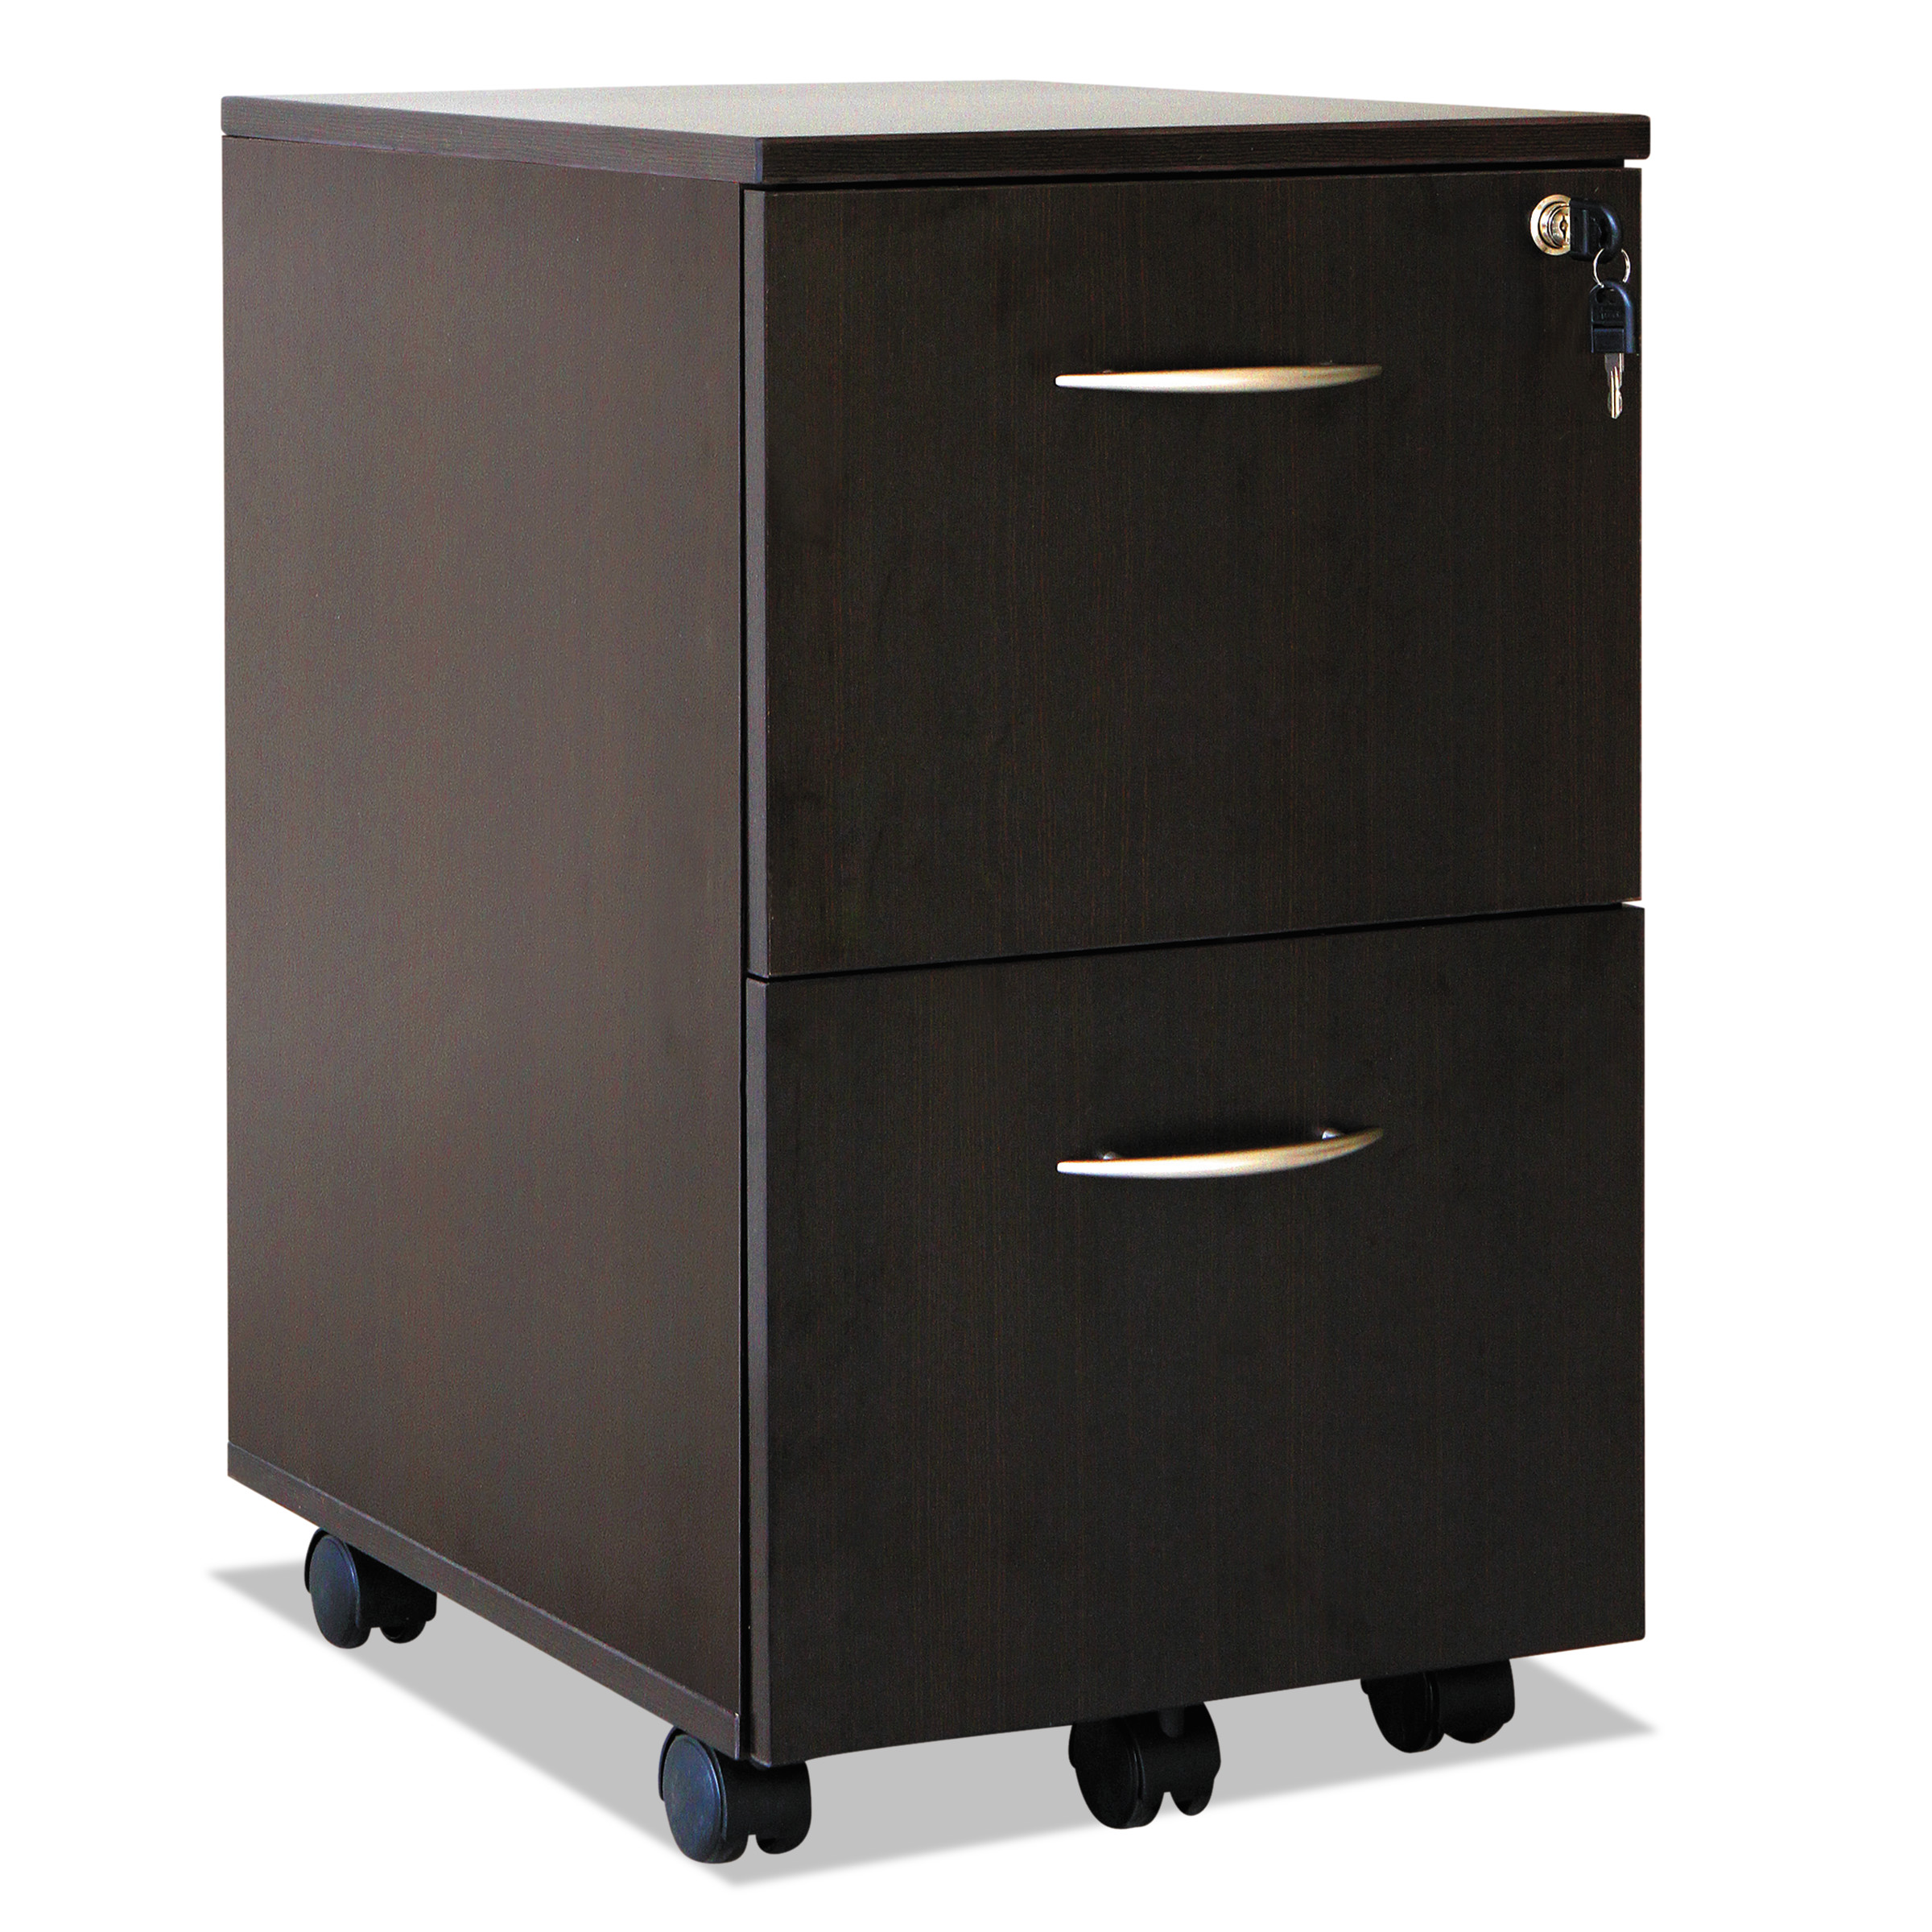 Alera 2 Drawers Vertical Lockable Filing Cabinet, Espresso